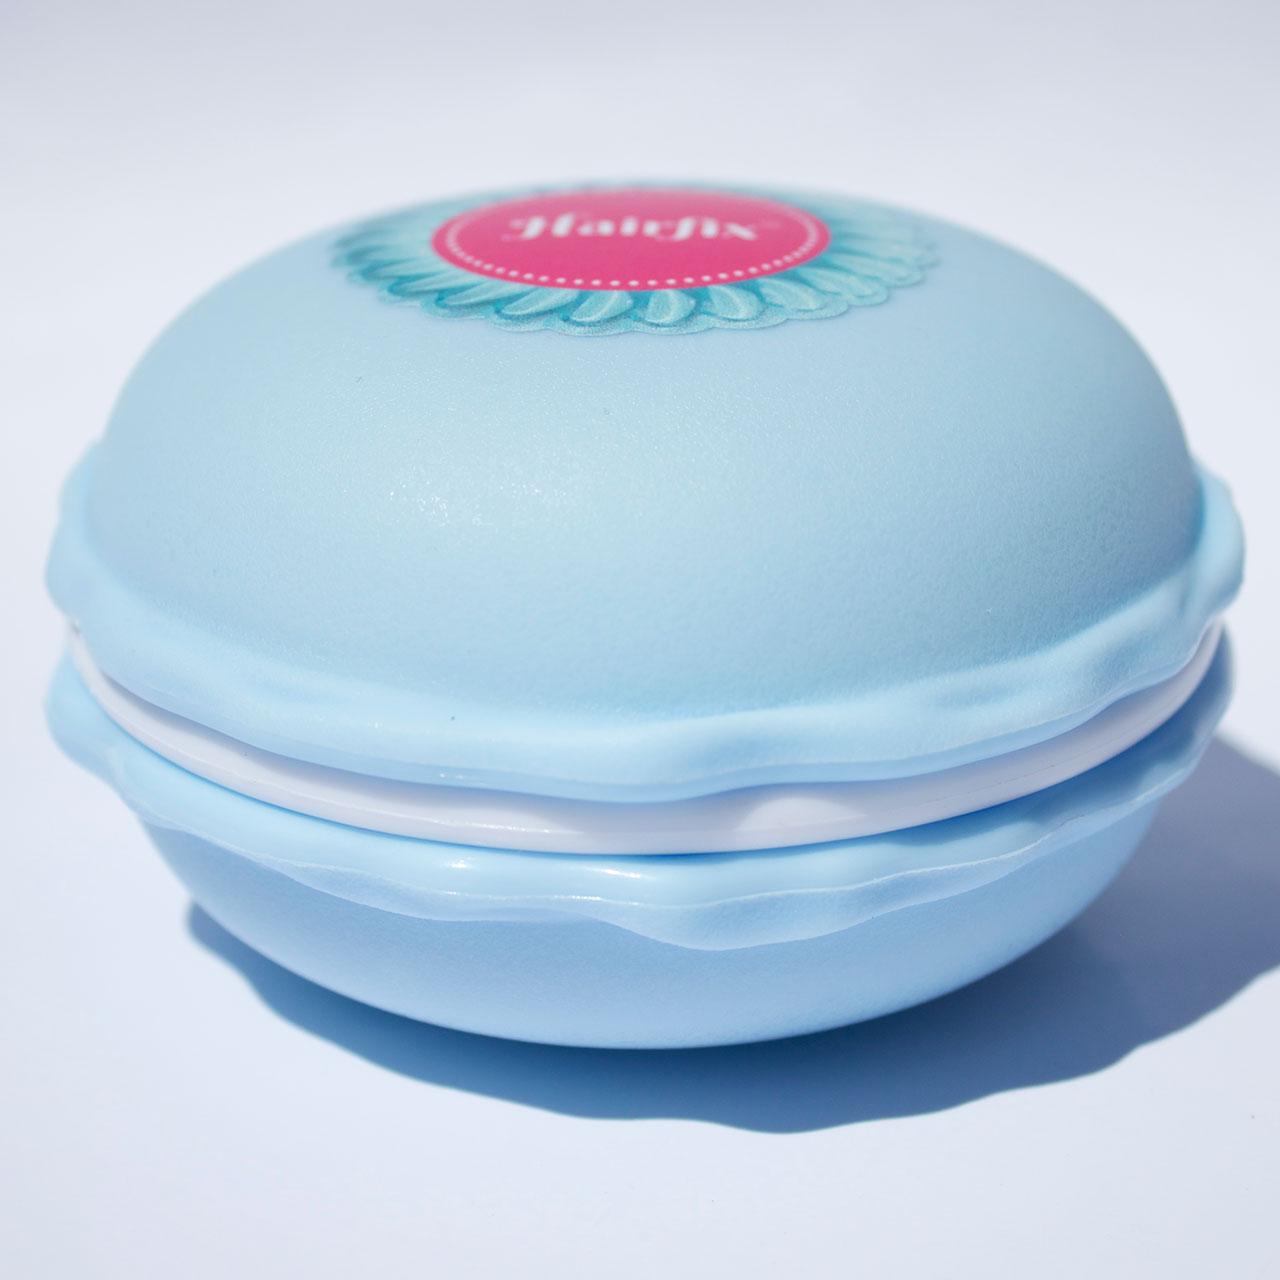 Bledomodrá krabička na gumičky Hairfix - Macaron Box Baby Blue